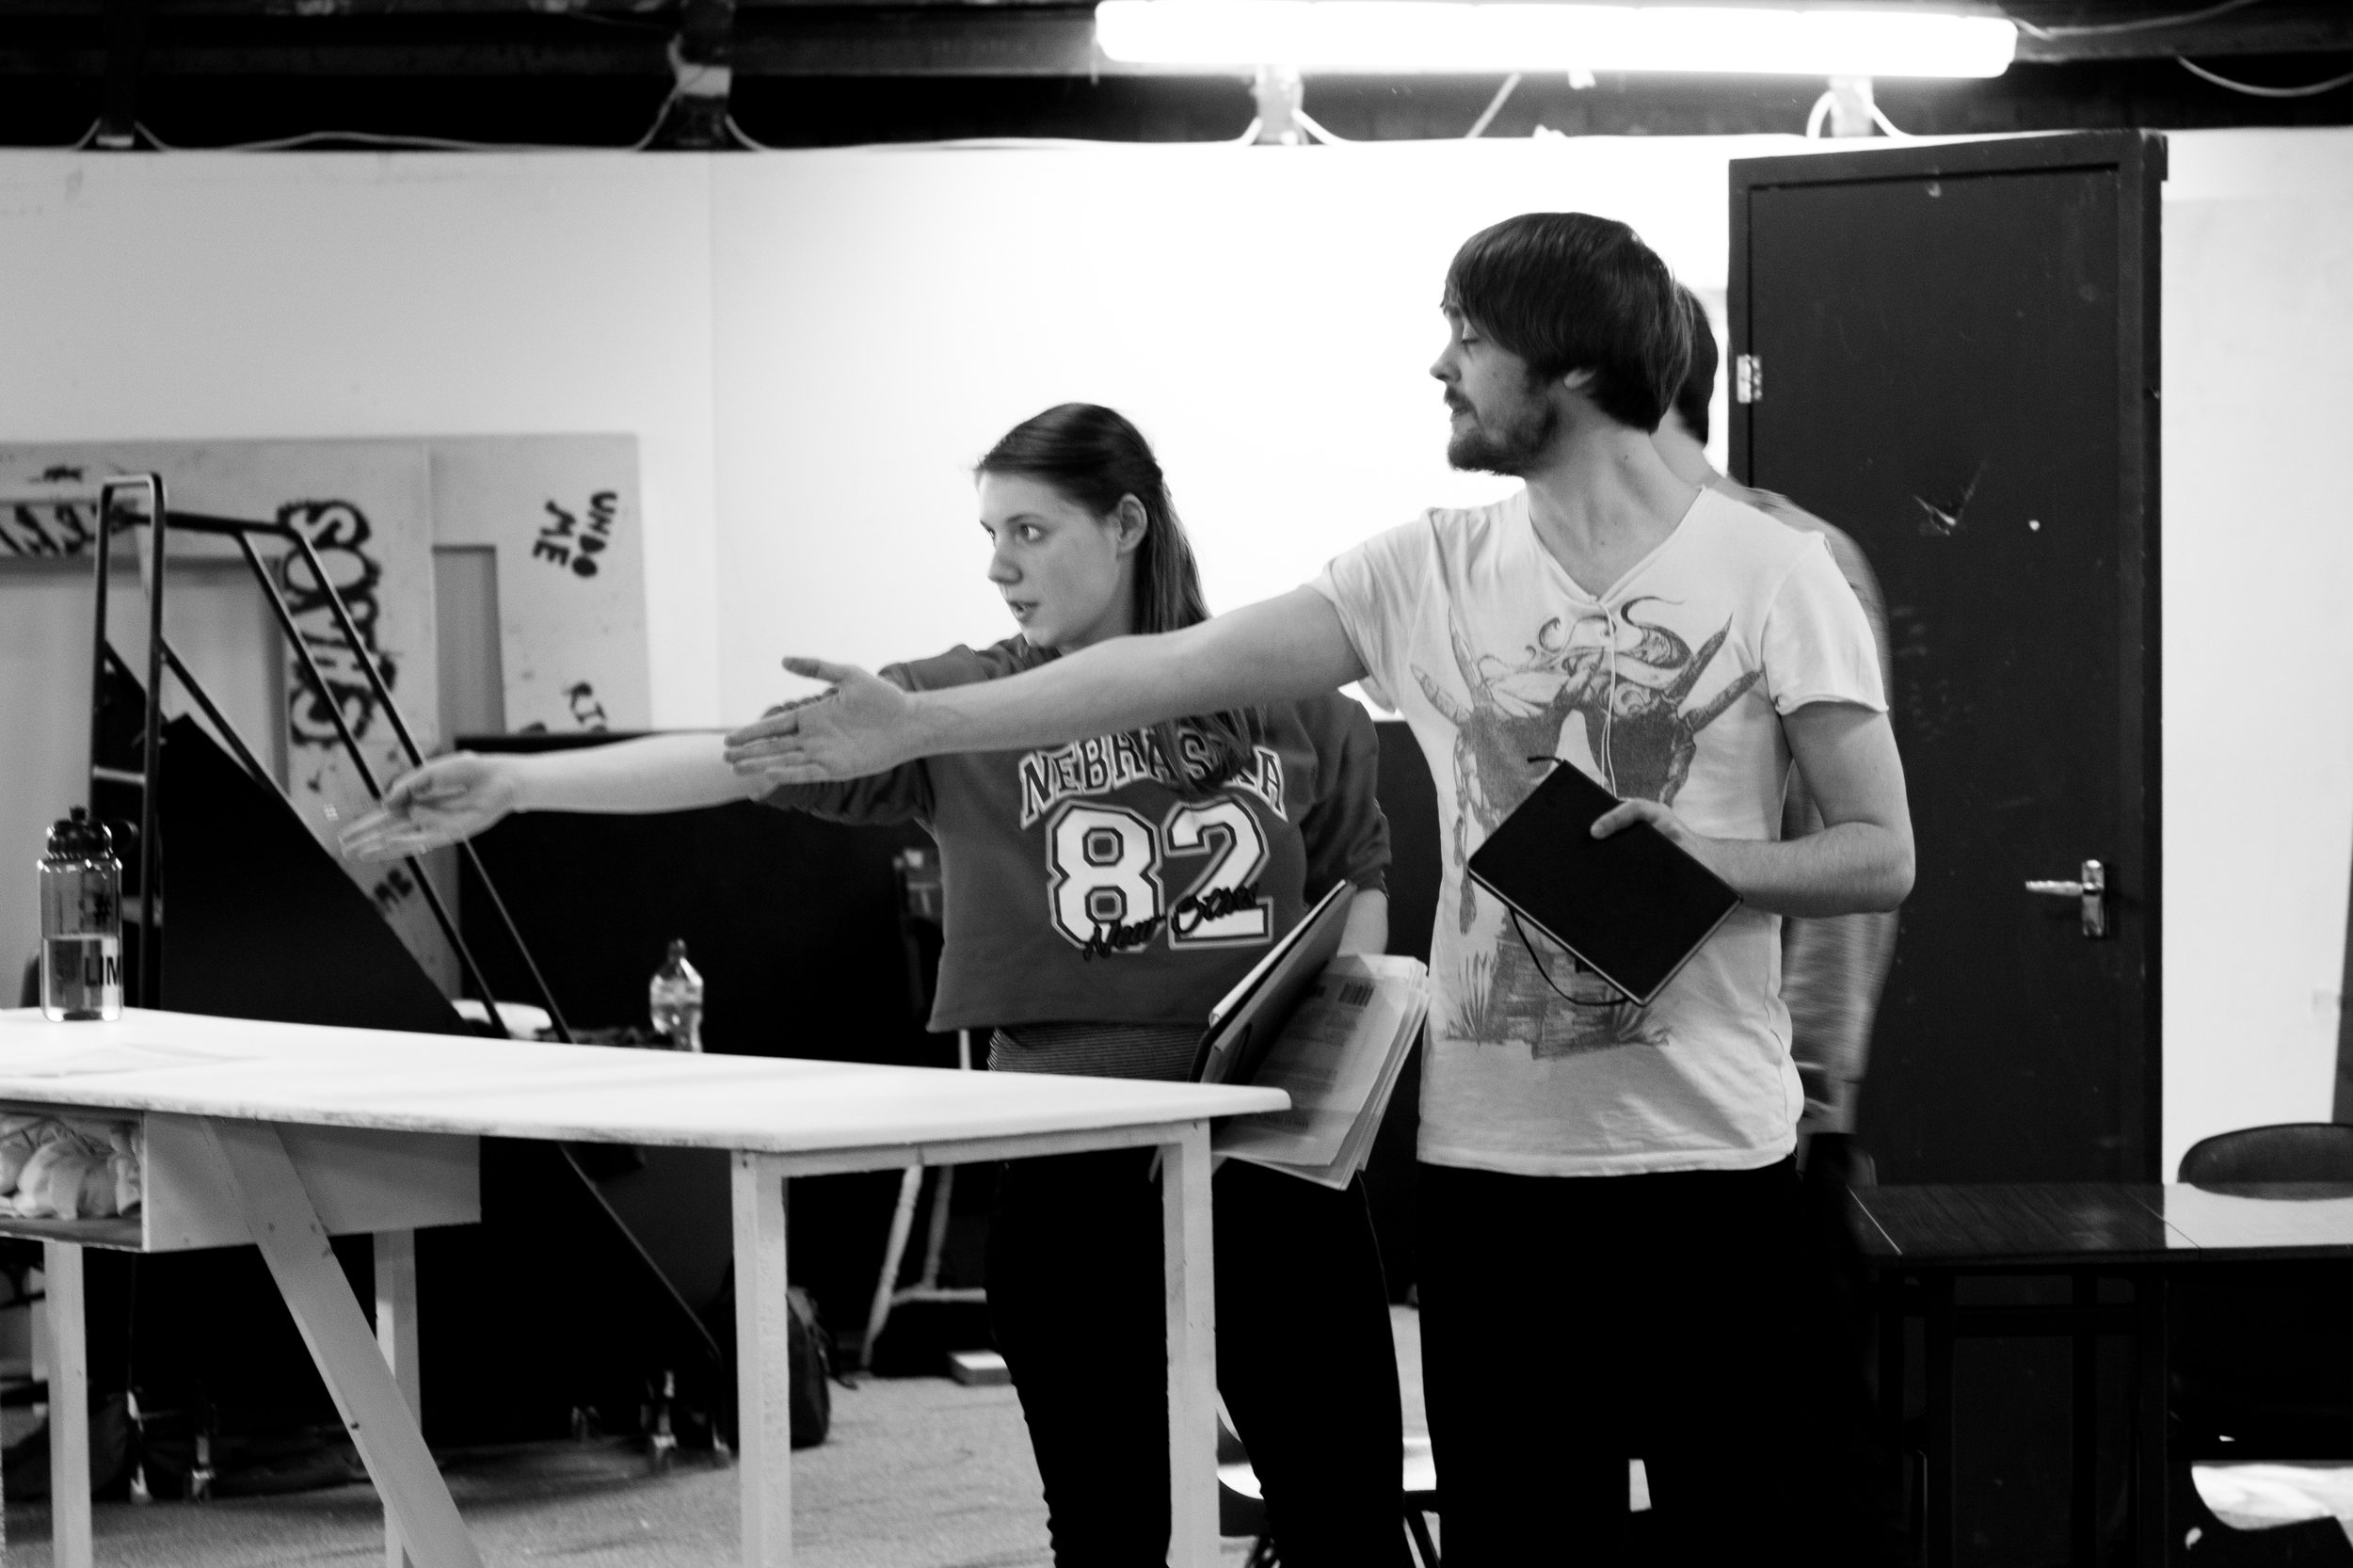 Killer Joe Rehearsal-edit-16 2.jpg